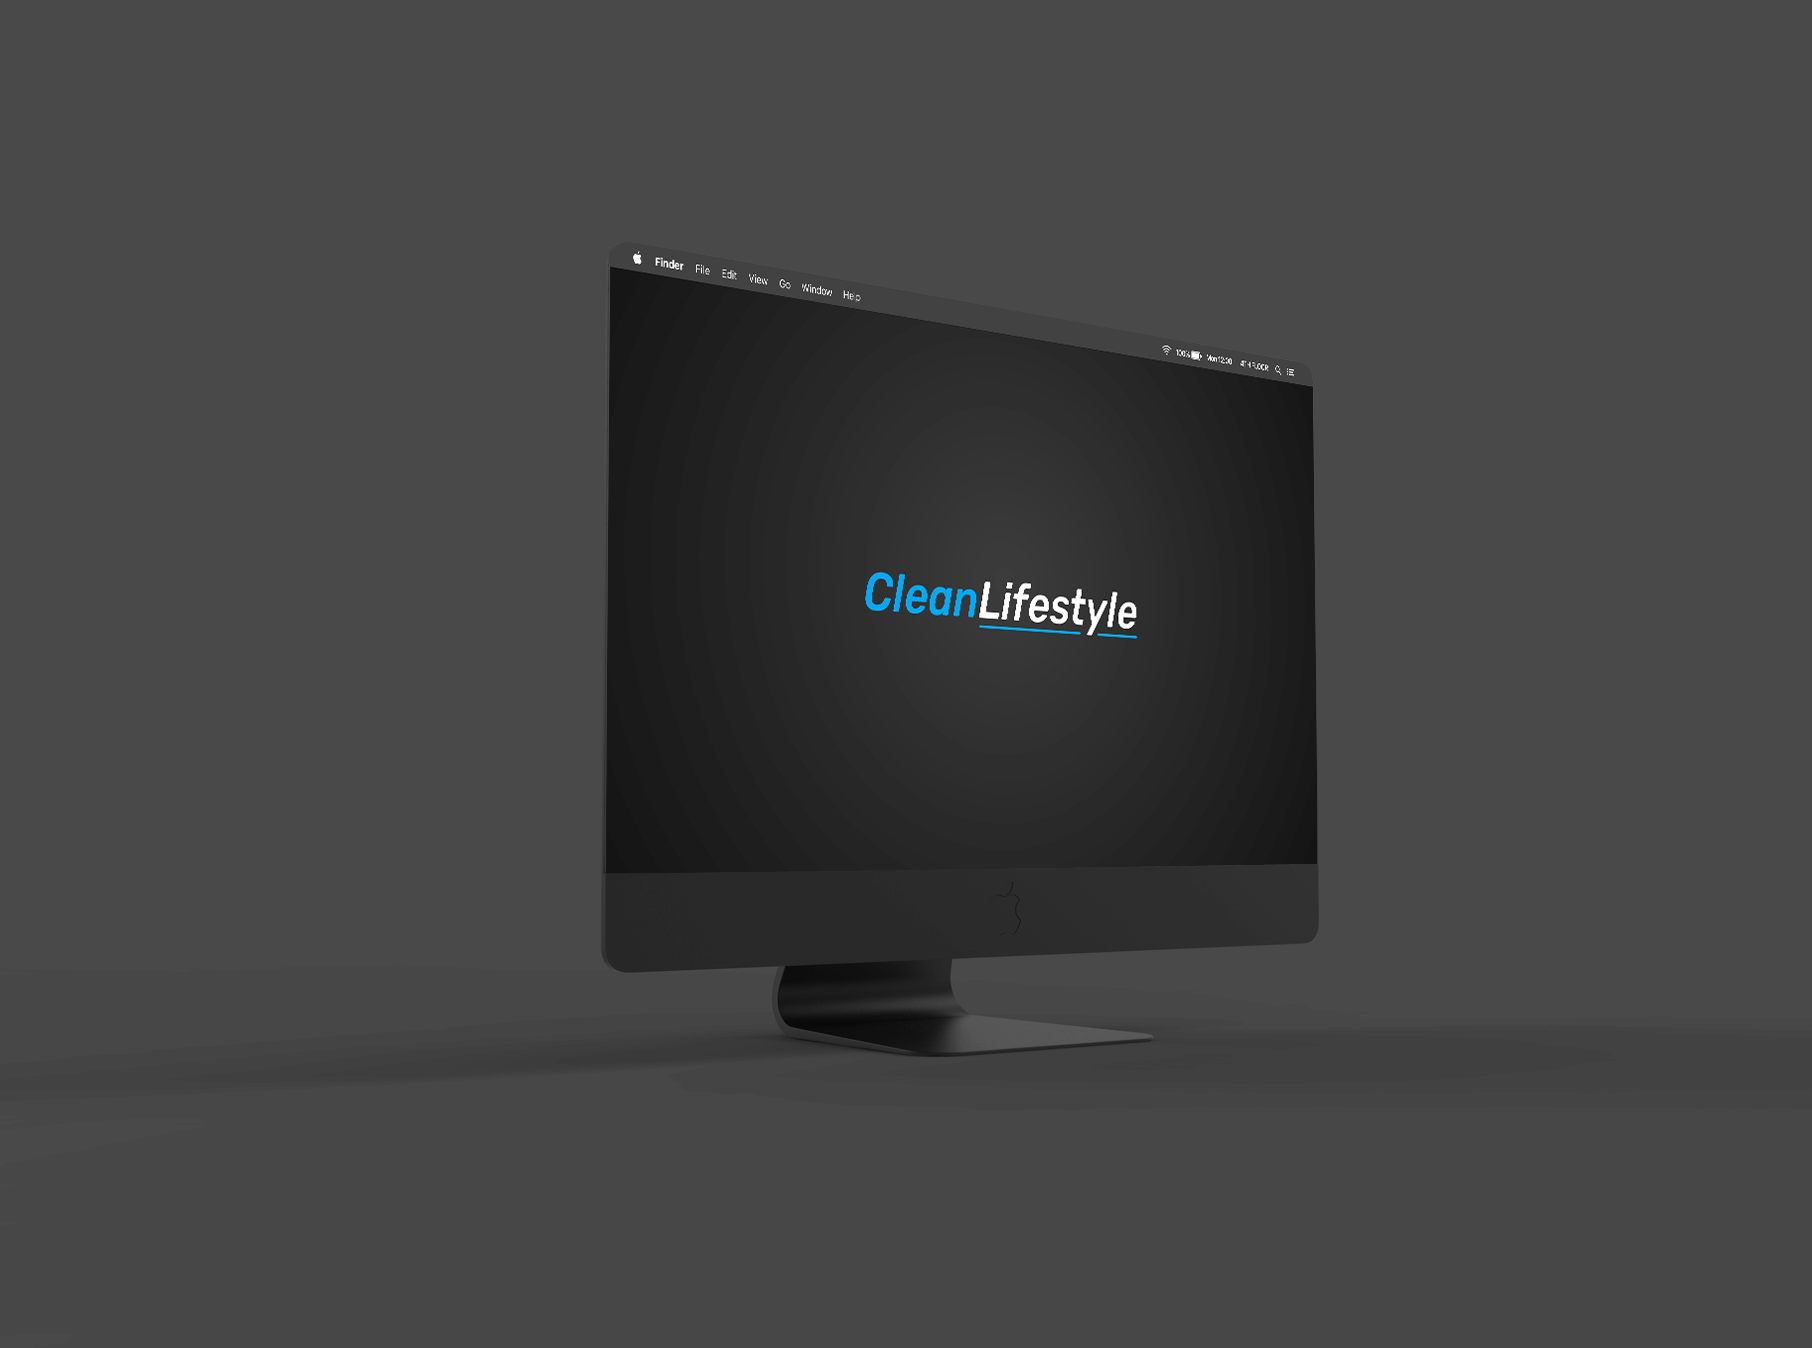 cleanlifestyle logo